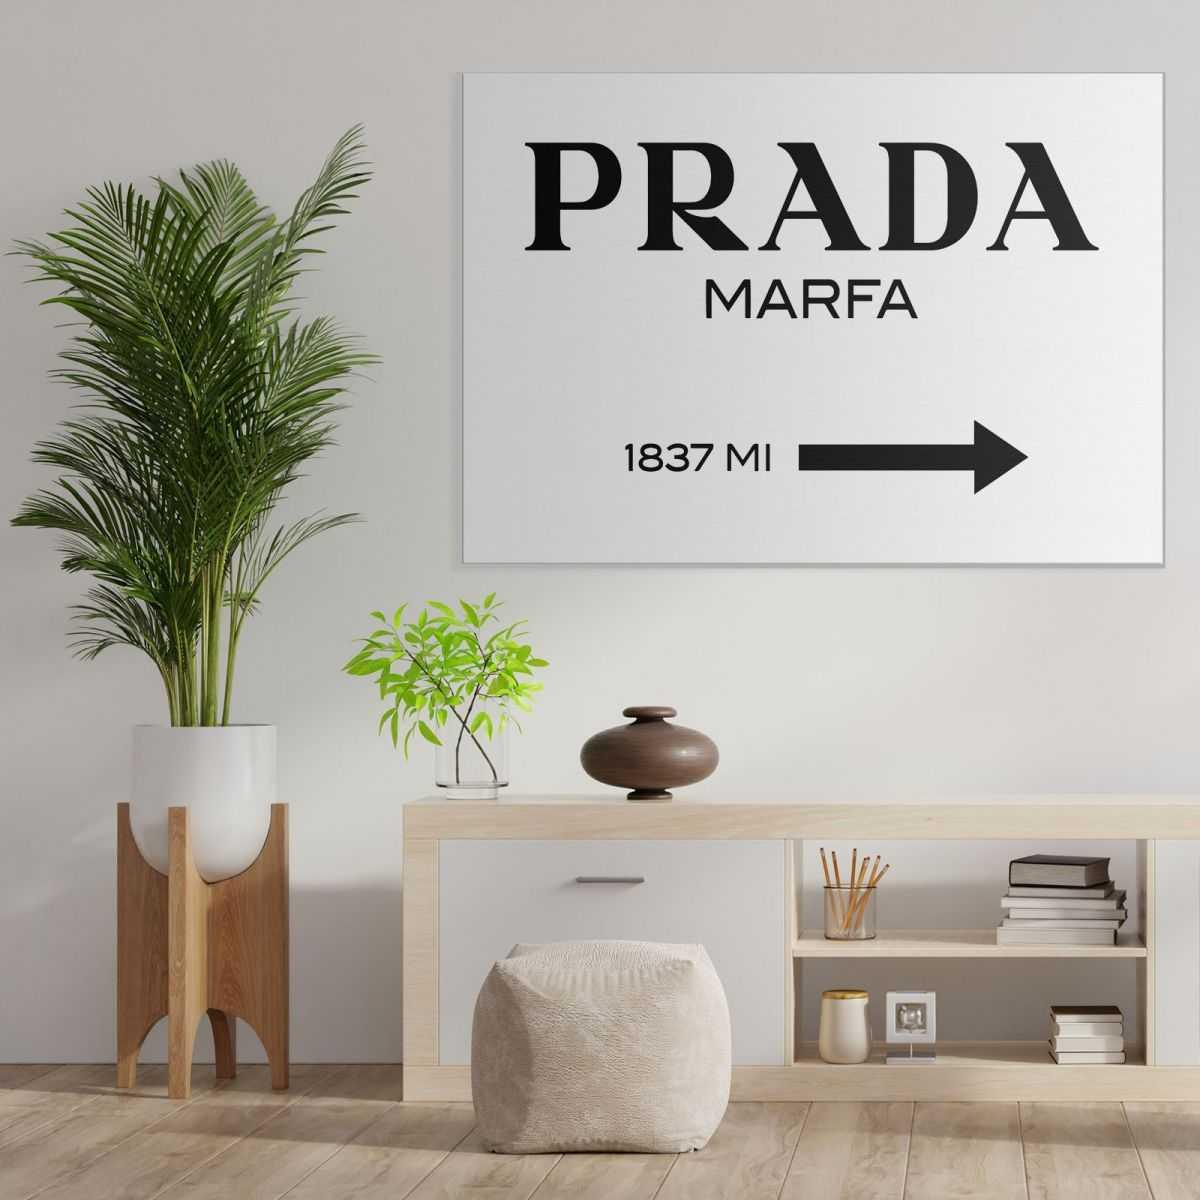 ❤️ Quadro Prada Marfa originale stampa su tela pro0